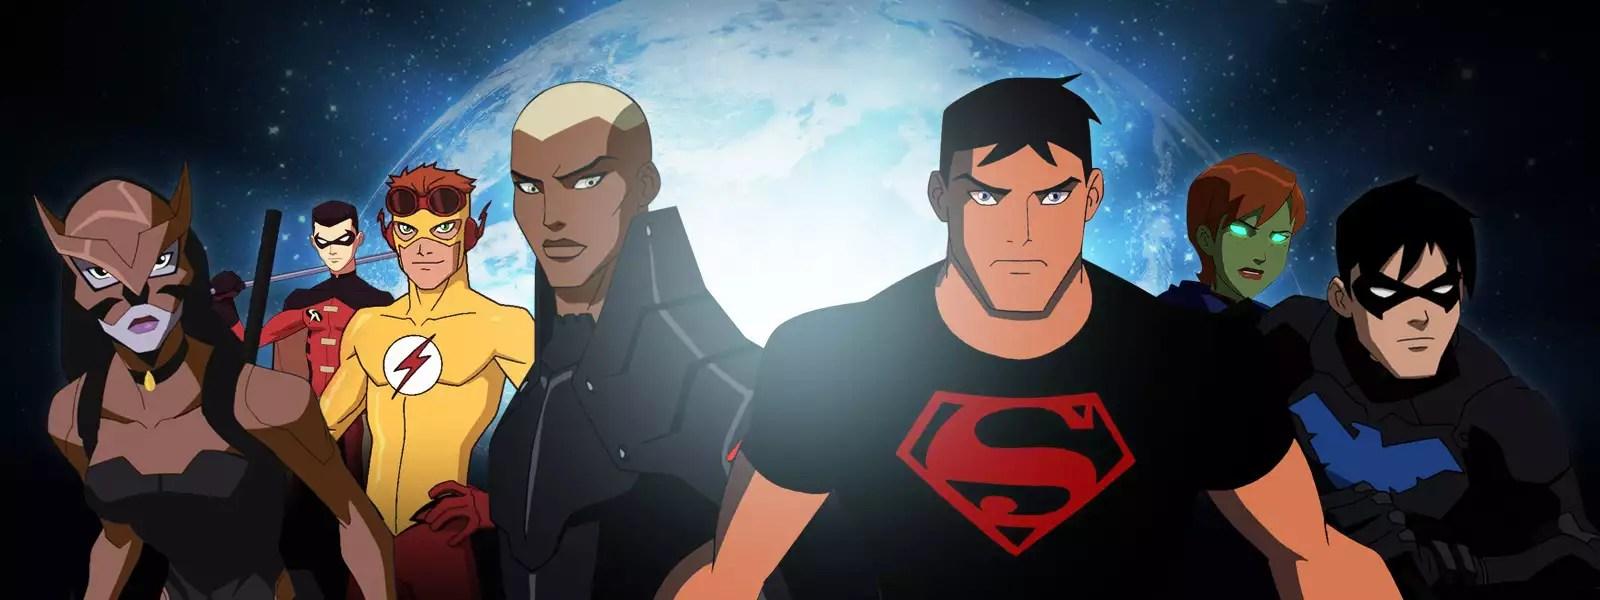 Batman serie animada 2019 latino dating